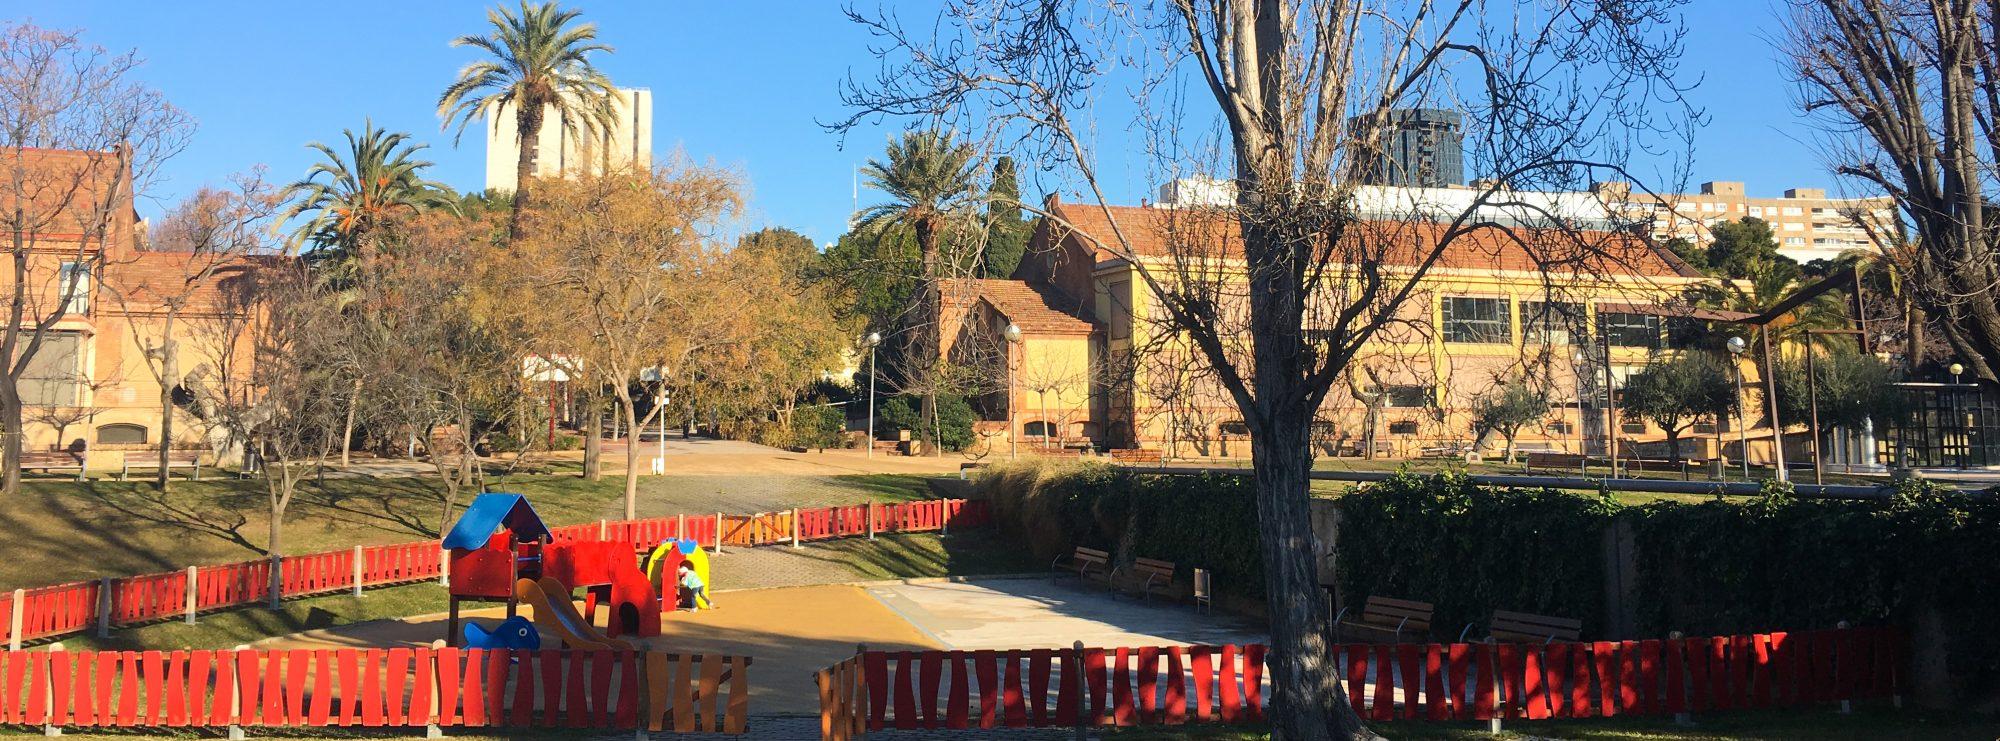 Barcelone secrète en famille : Jardins de la Maternitat